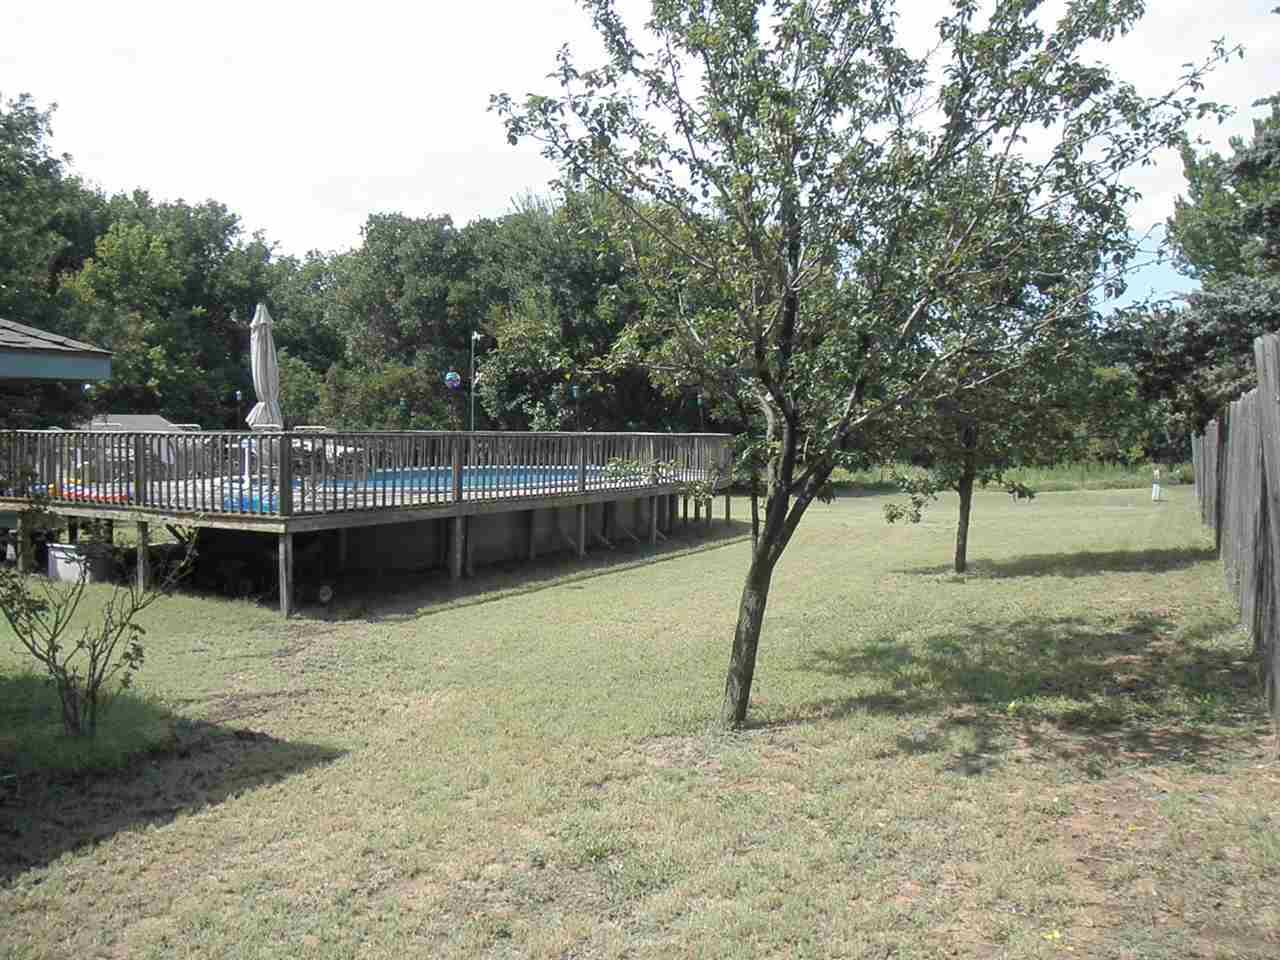 Sold Intraoffice W/MLS | 7 Raintree Ponca City, OK 74604 4